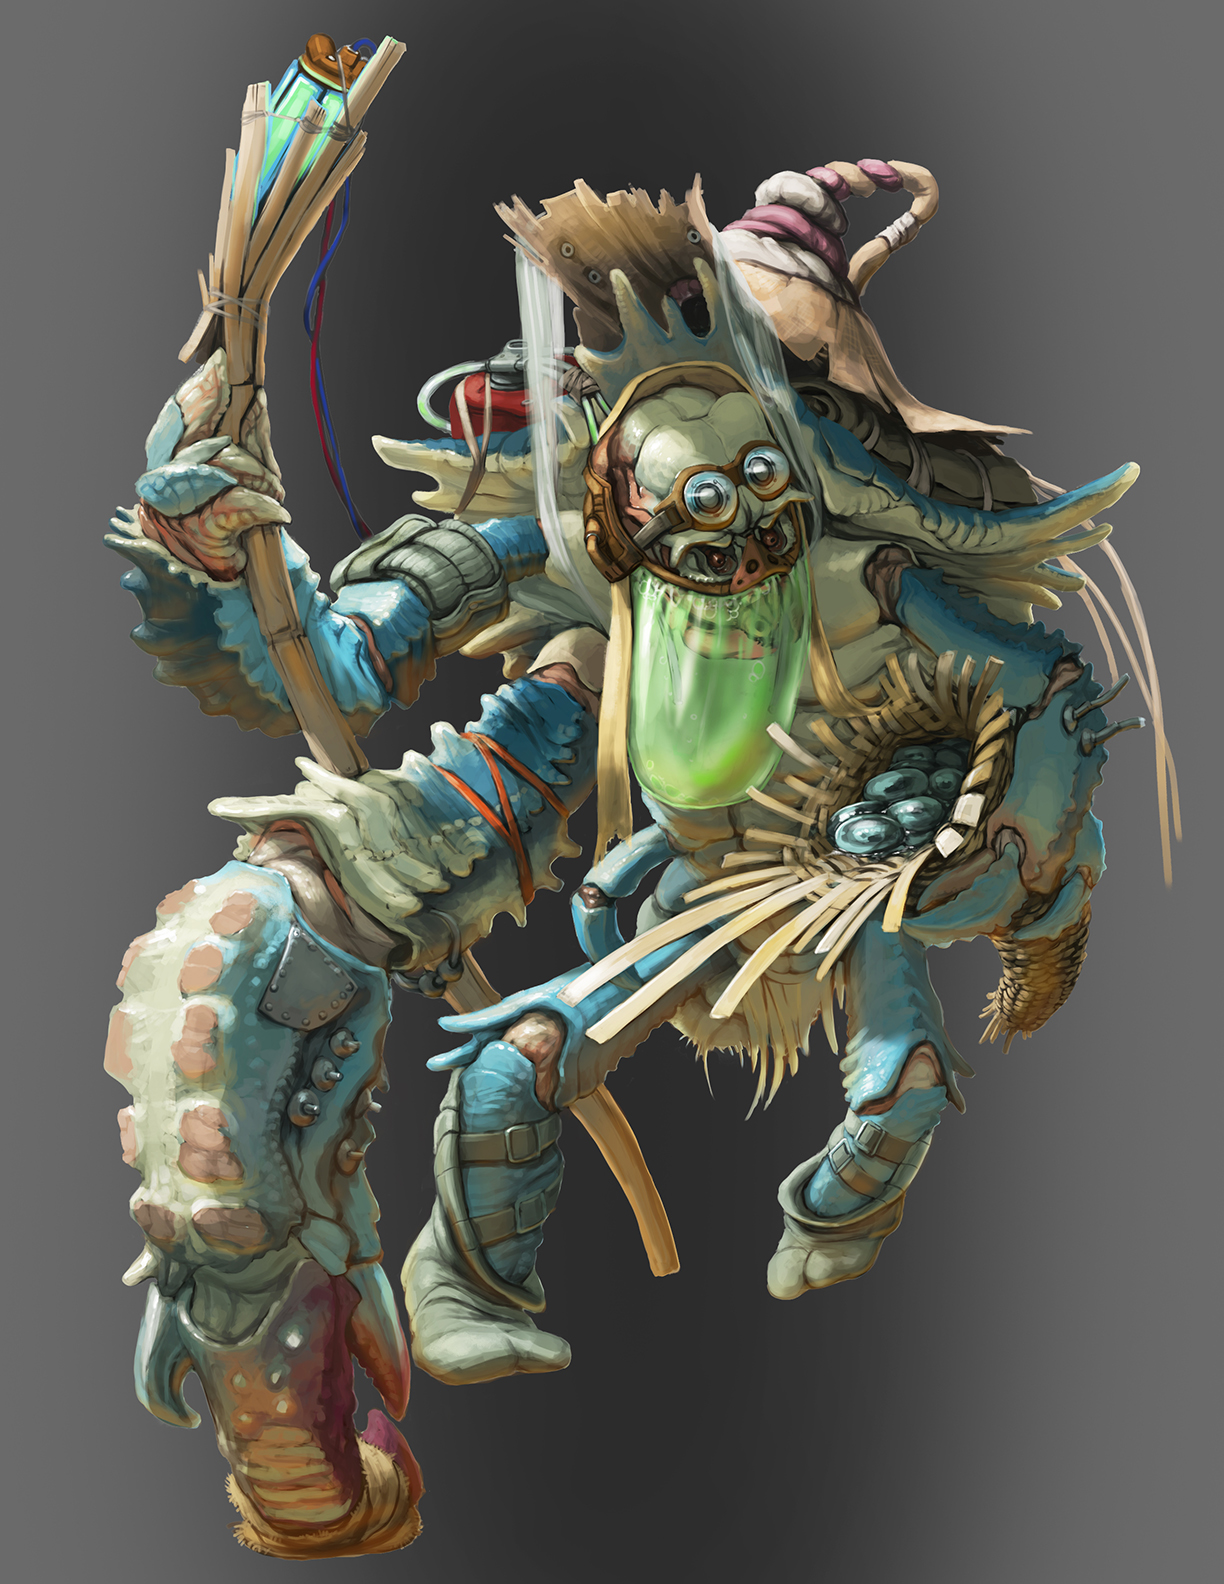 Lien crab-man